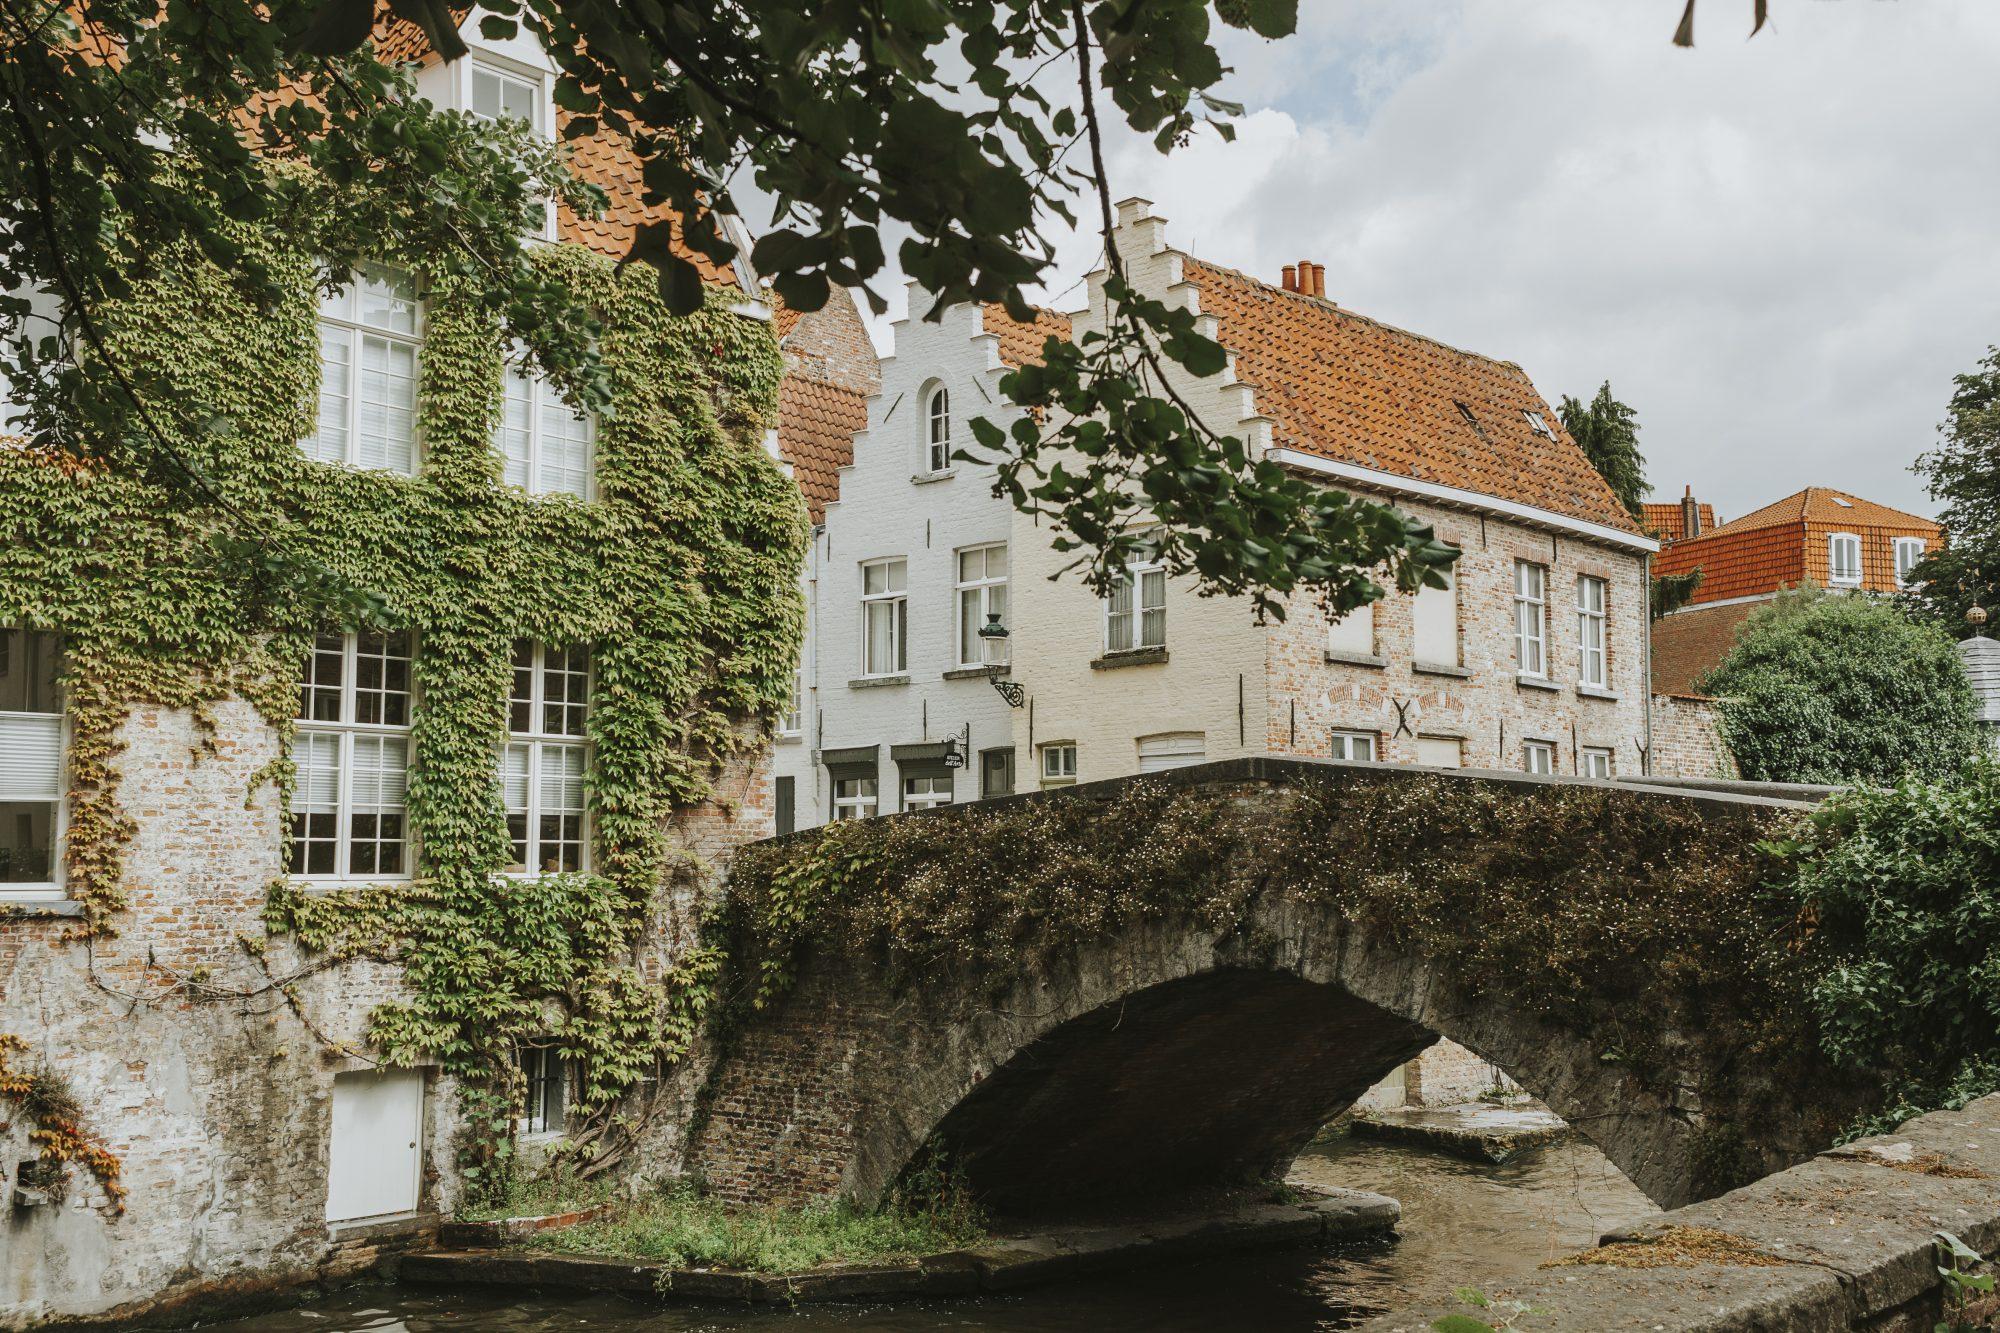 Bridge on Perdenstraat